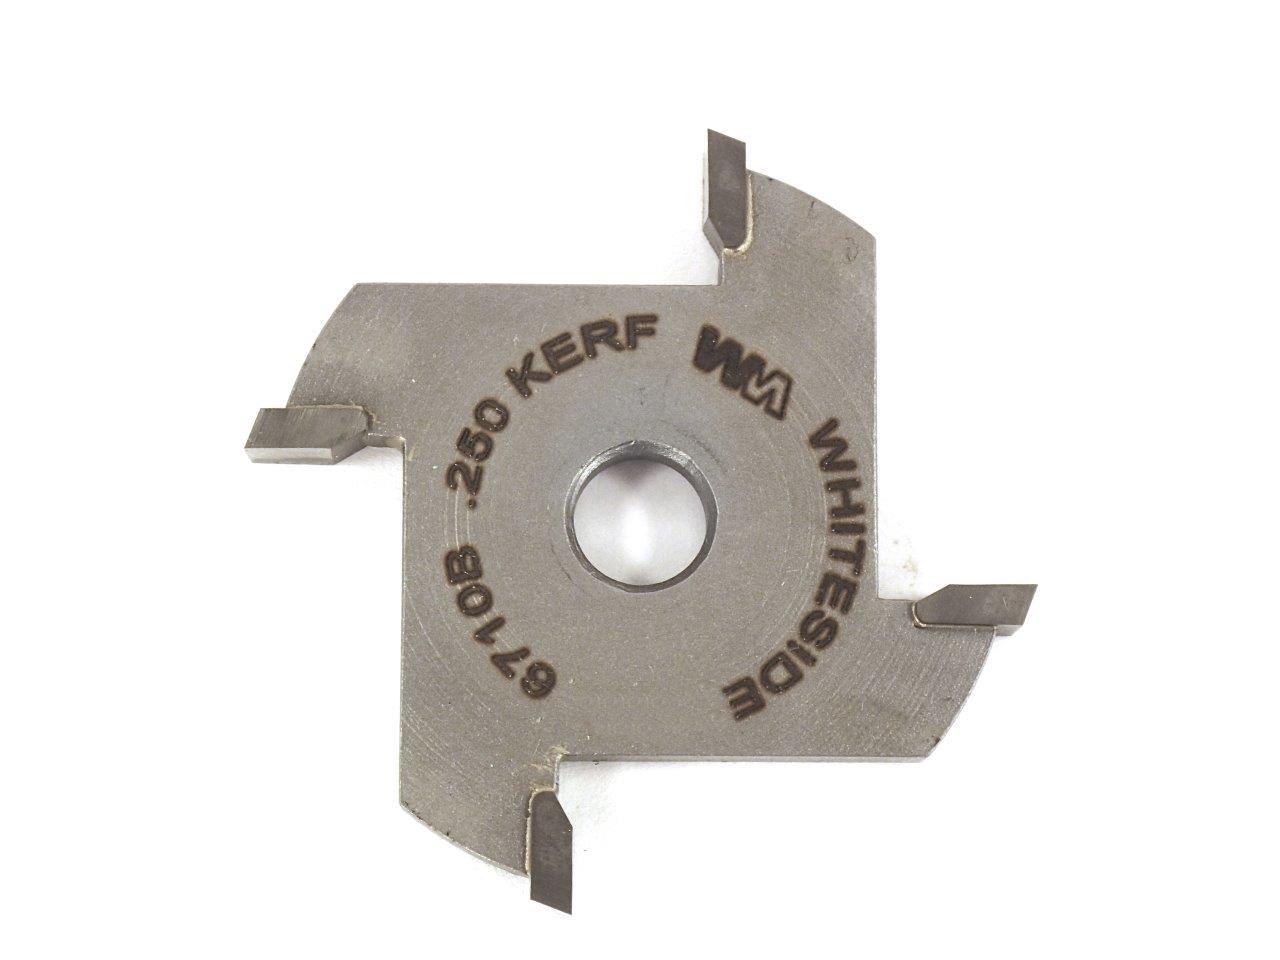 4 Wing Slot Cutter, 1-7/8 Dia, 1/4 Kerf, 5/16 Bore, Whiteside 6710B